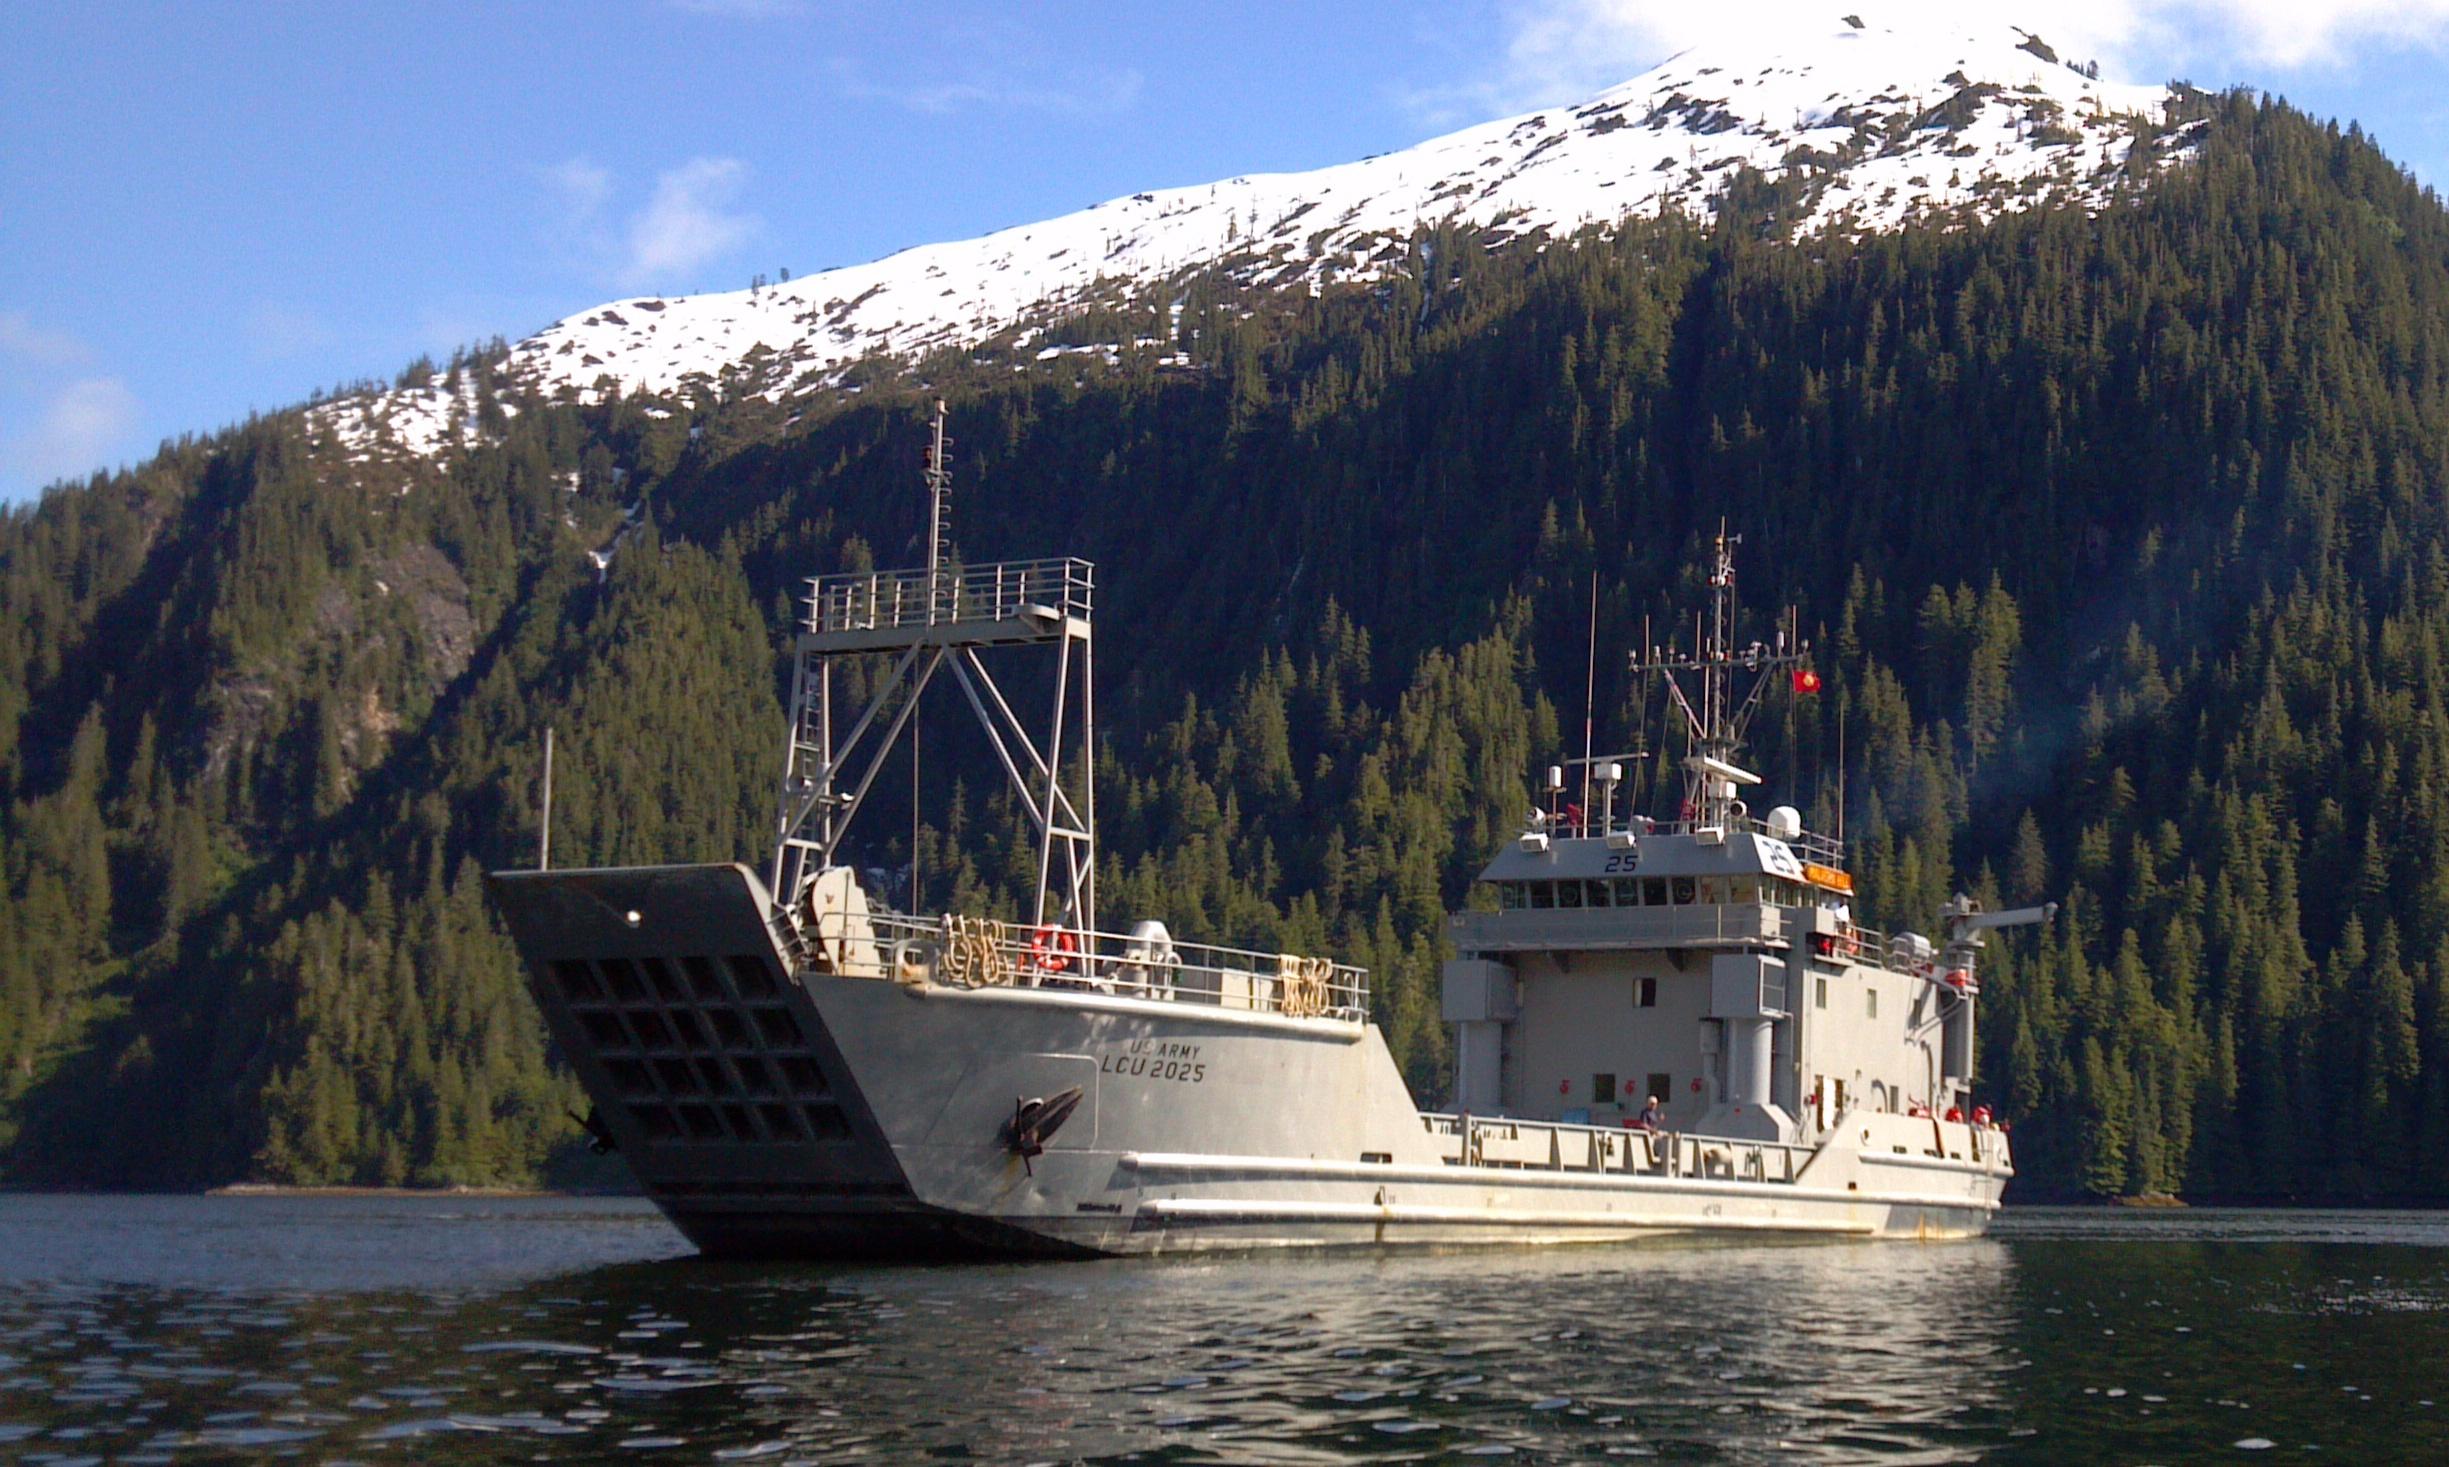 Sail Army Runnymede Class Large Landing Craft Usav